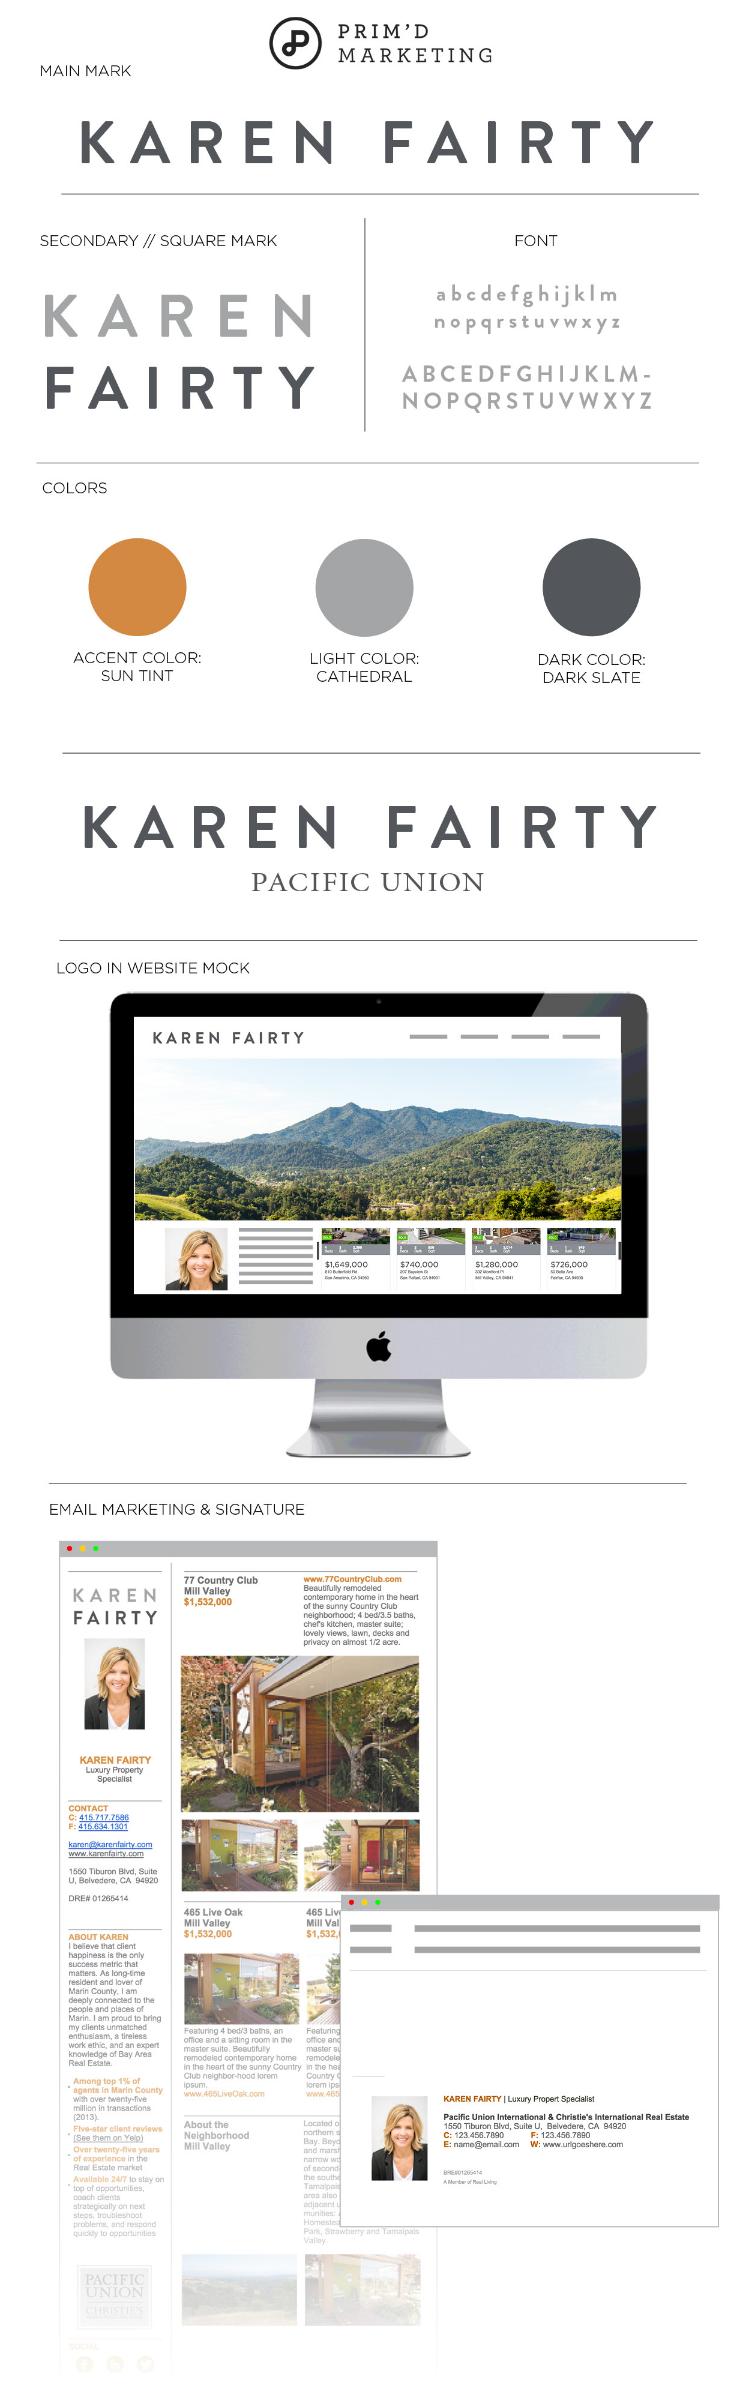 Primd Marketing - Case Study - Karen Fairty Branding